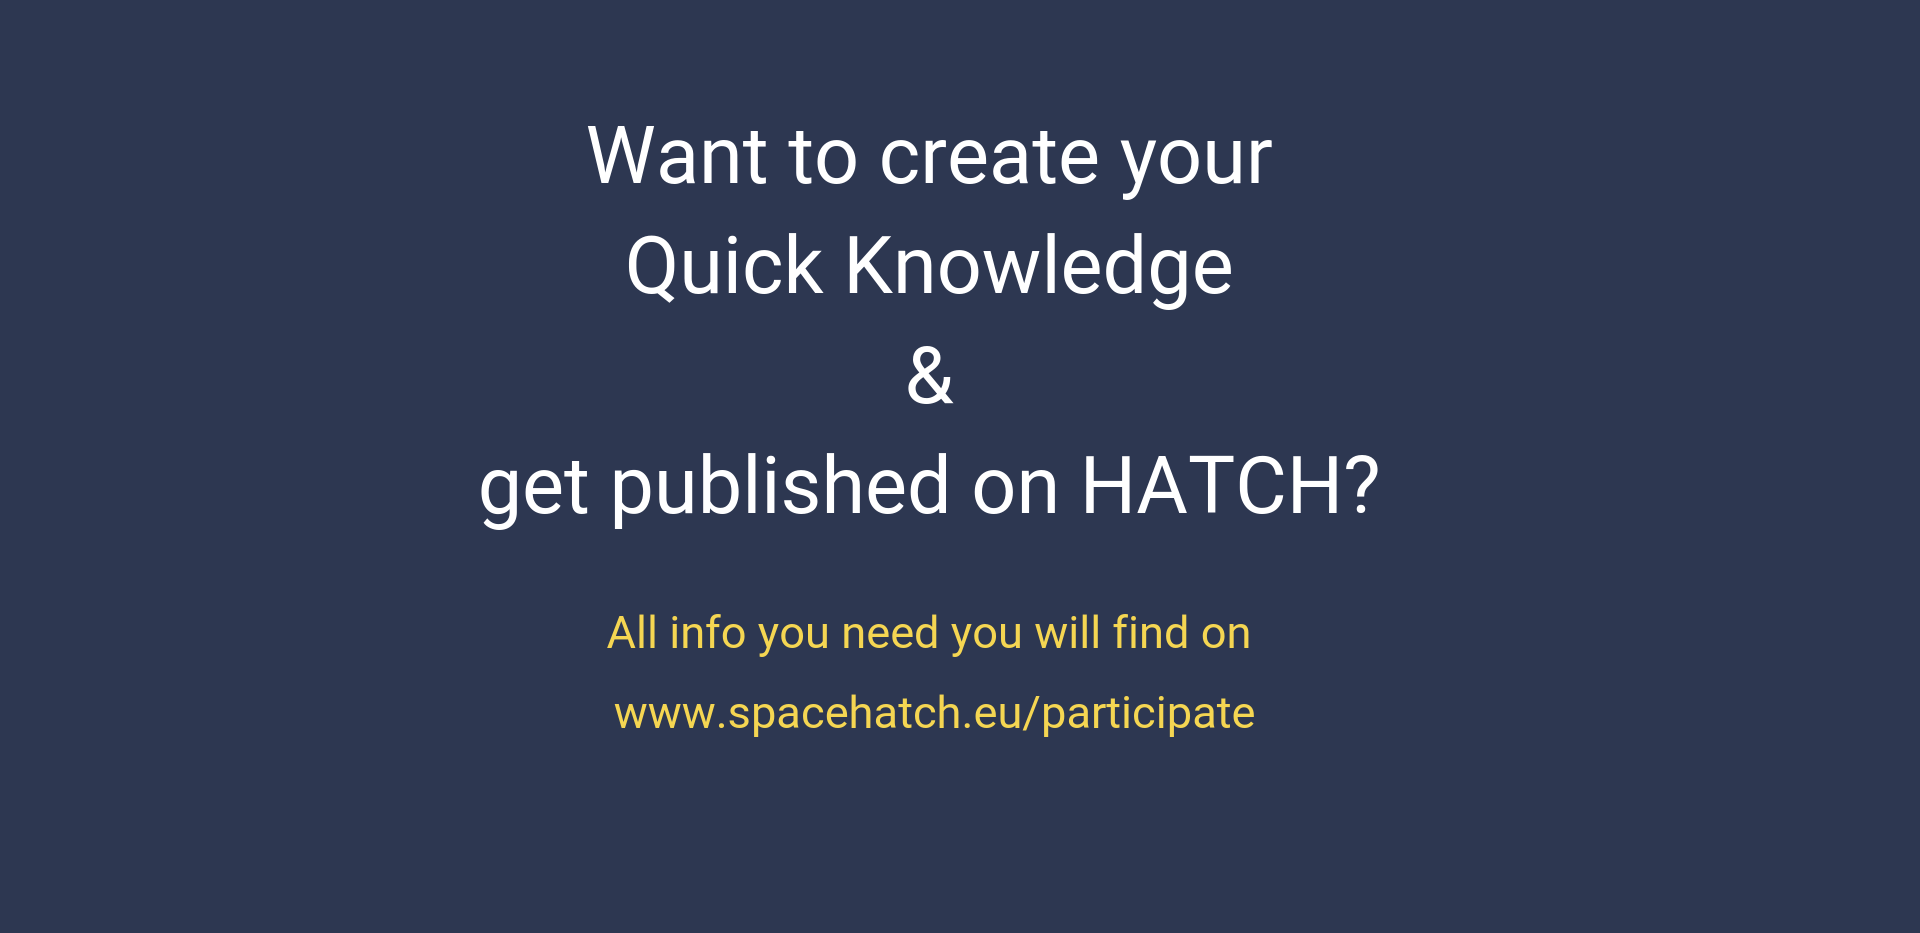 HATCH Quick Knowledge